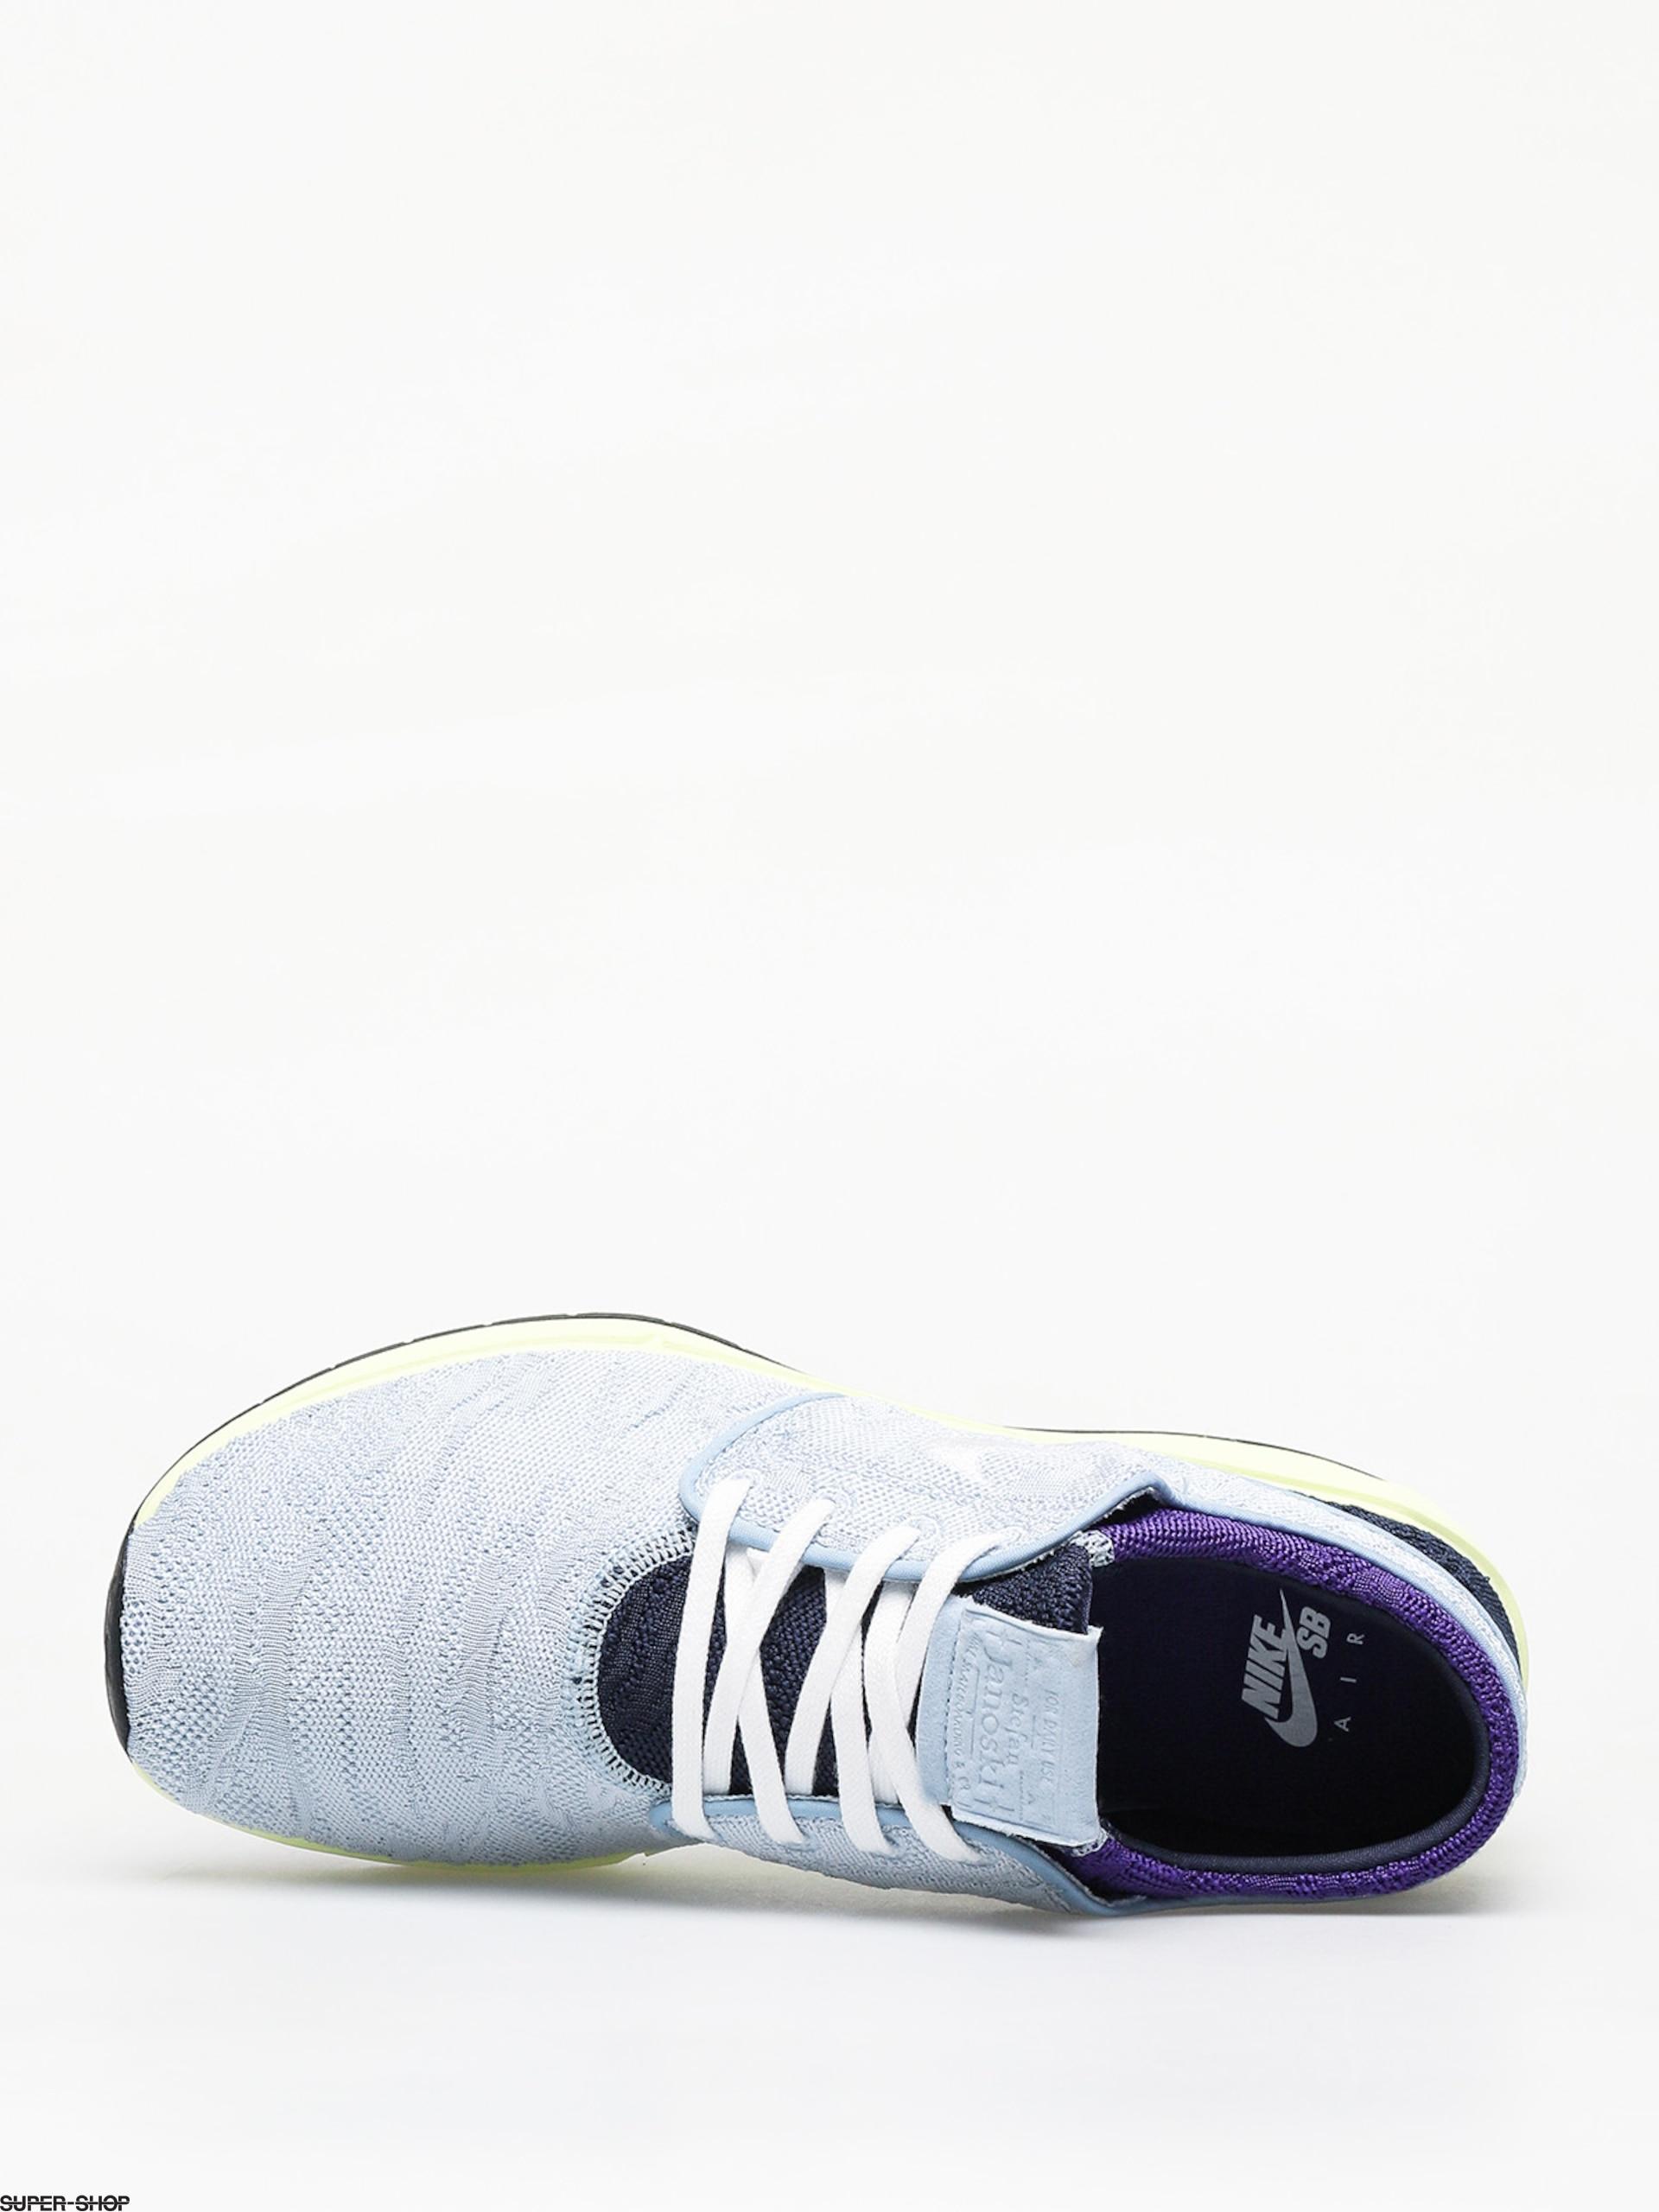 Nike SB Air Max Janoski 2 Skate Shoes Lt Armory BlueWhite Midnight